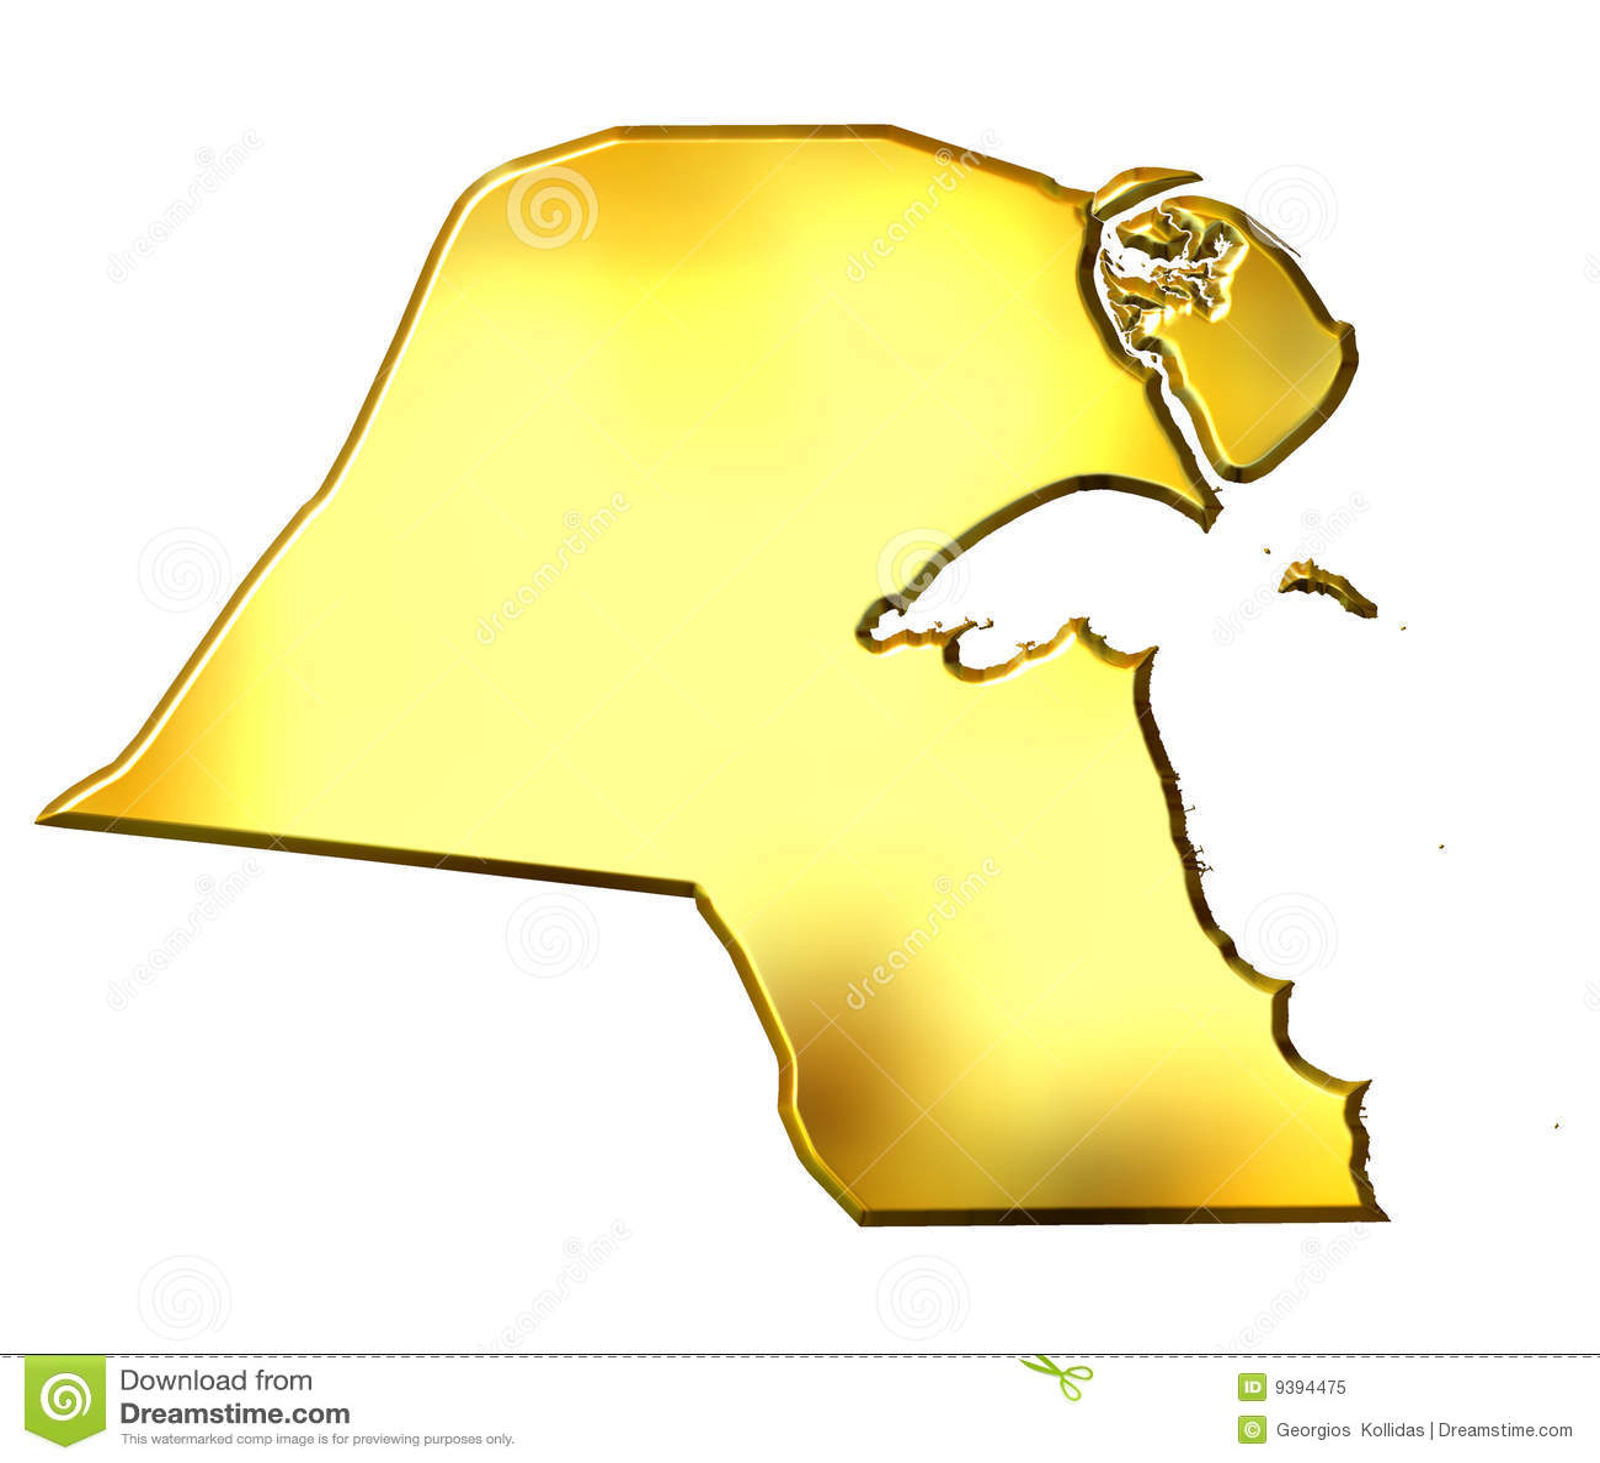 Kuwait 3d Golden Map Royalty Free Stock Photo - Image: 9394475